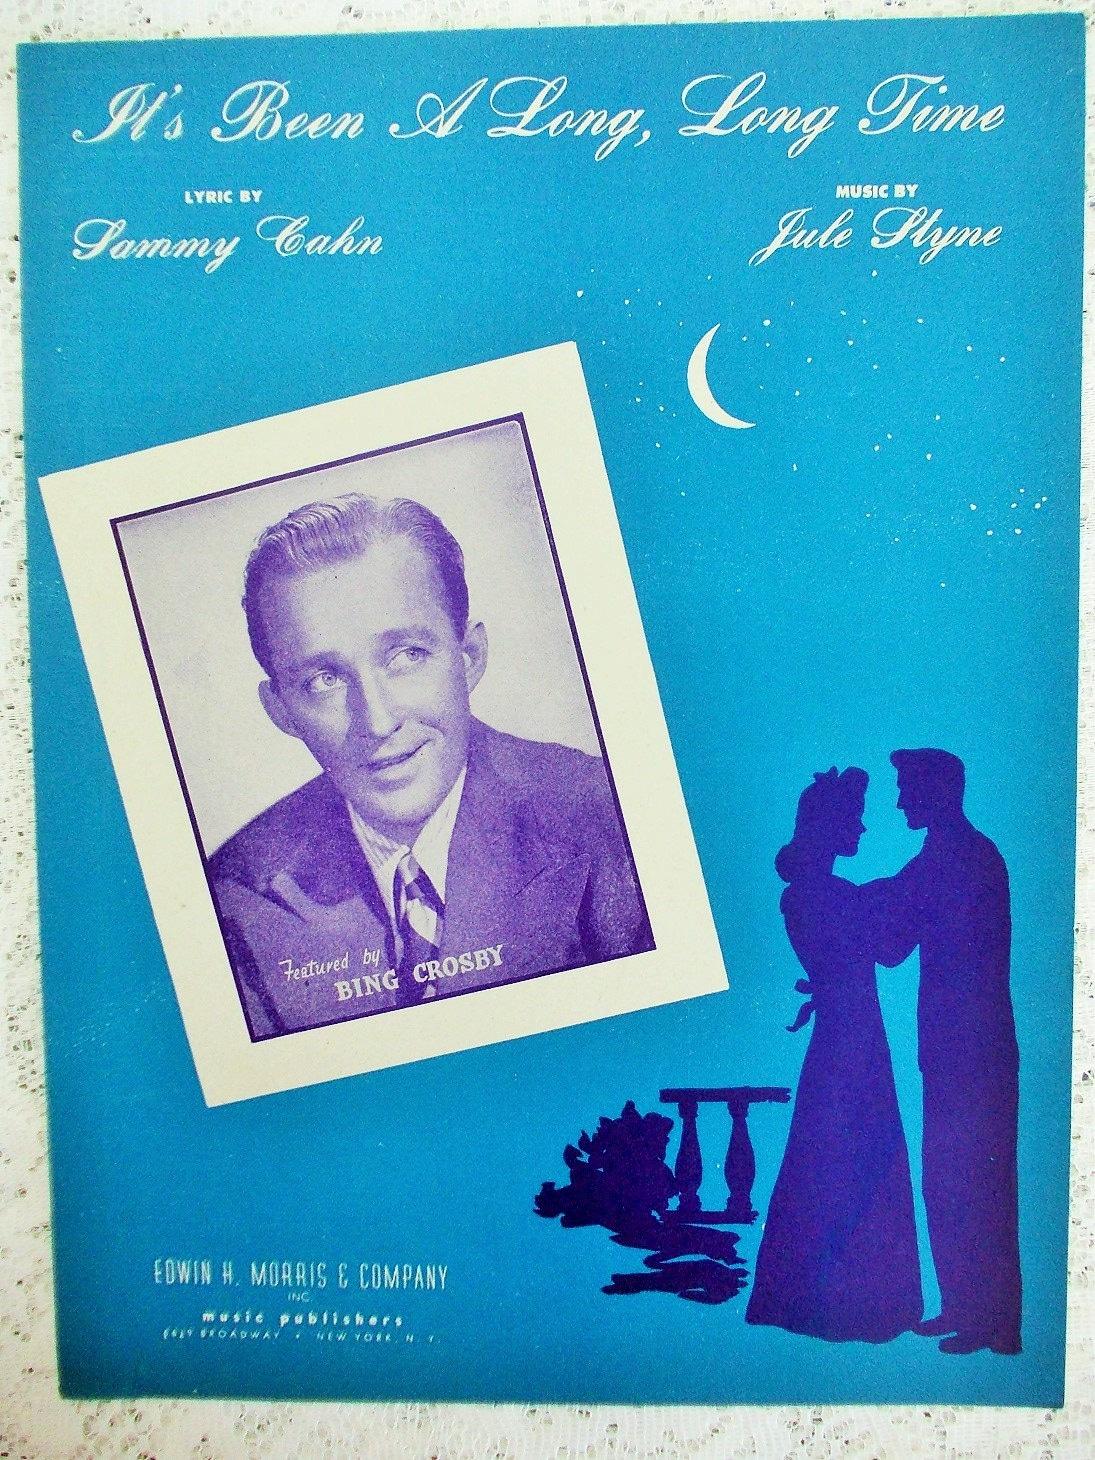 Bing Crosby Sheet Music 1945, It's Been a Long Long Time Decca Records